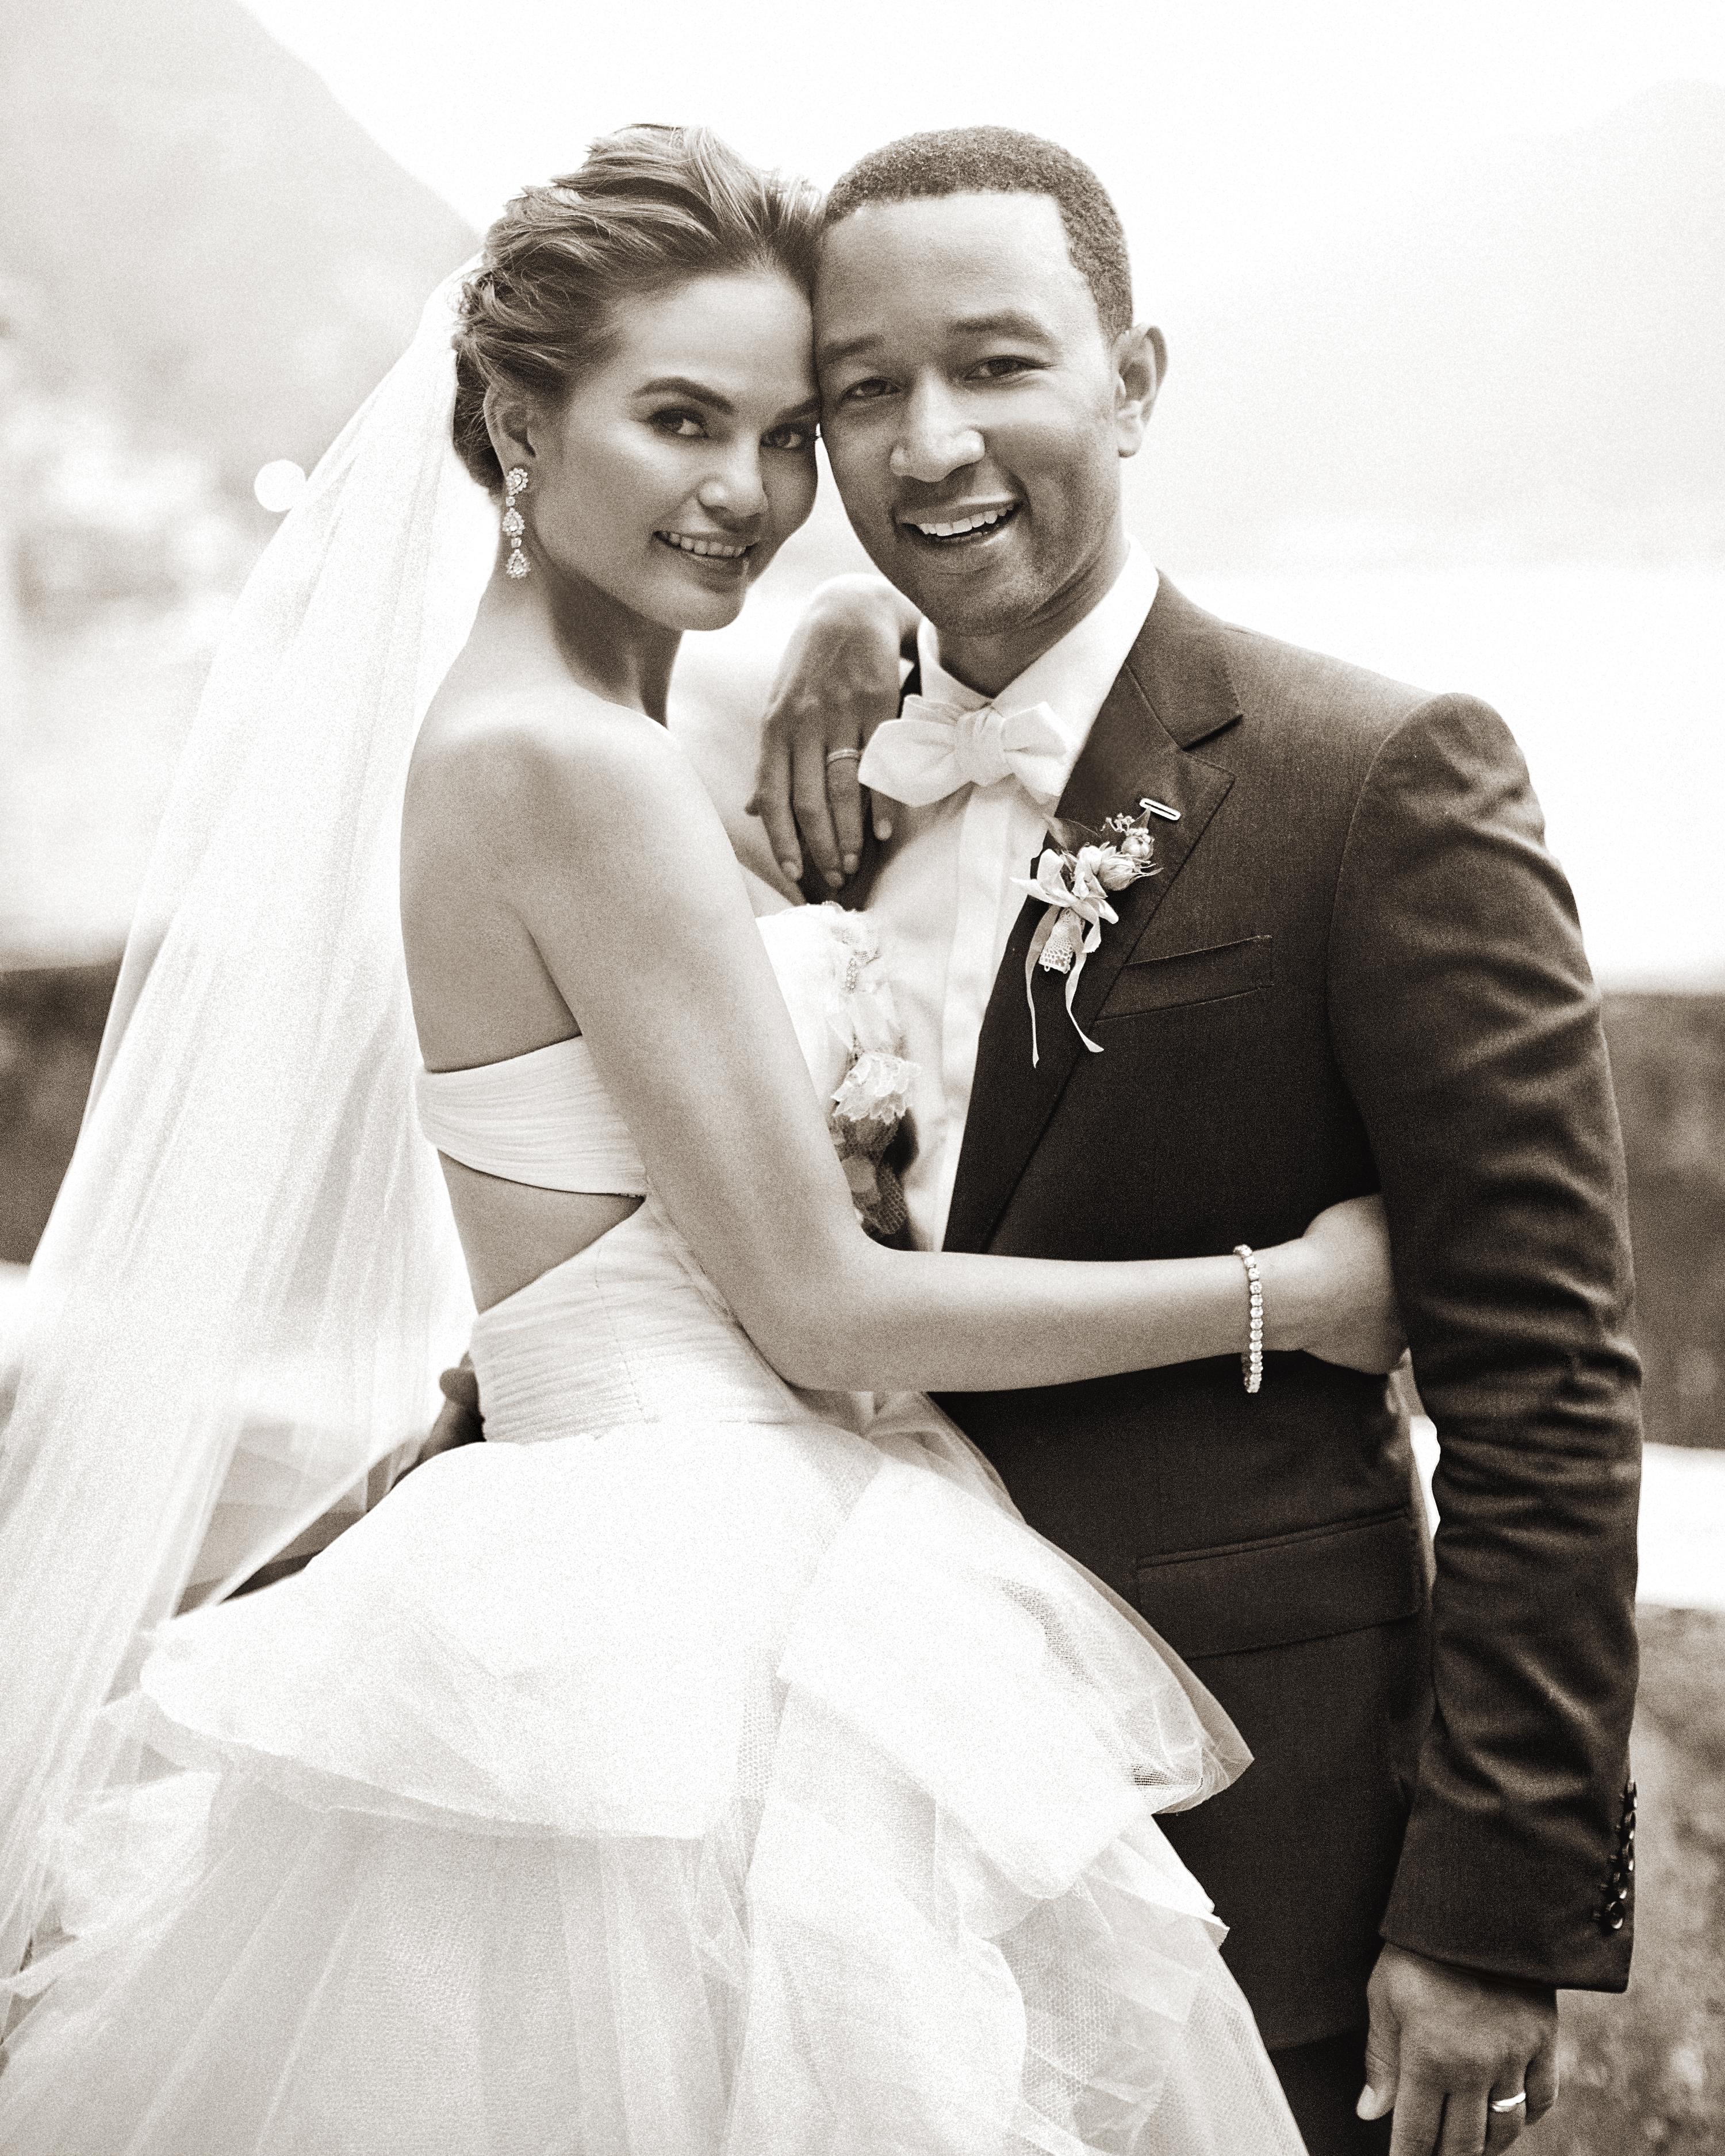 bride-groom-johnlegend-delesie0128-bw-mwds110843.jpg